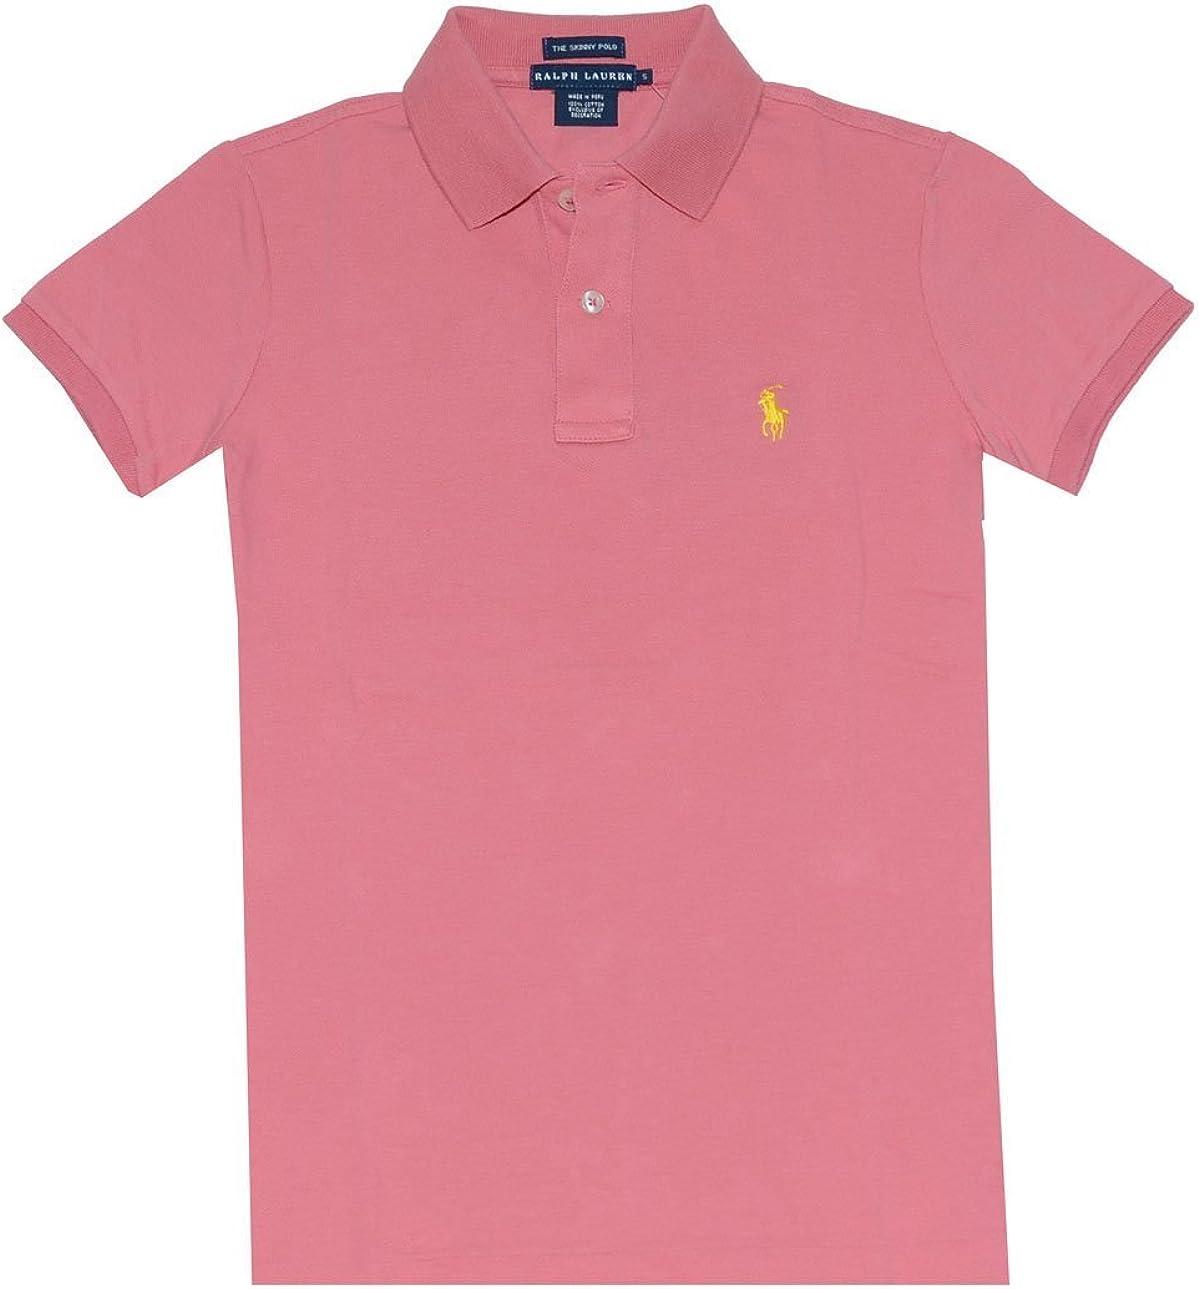 Ralph Lauren Polo de manga corta para mujer, color rosa claro ...